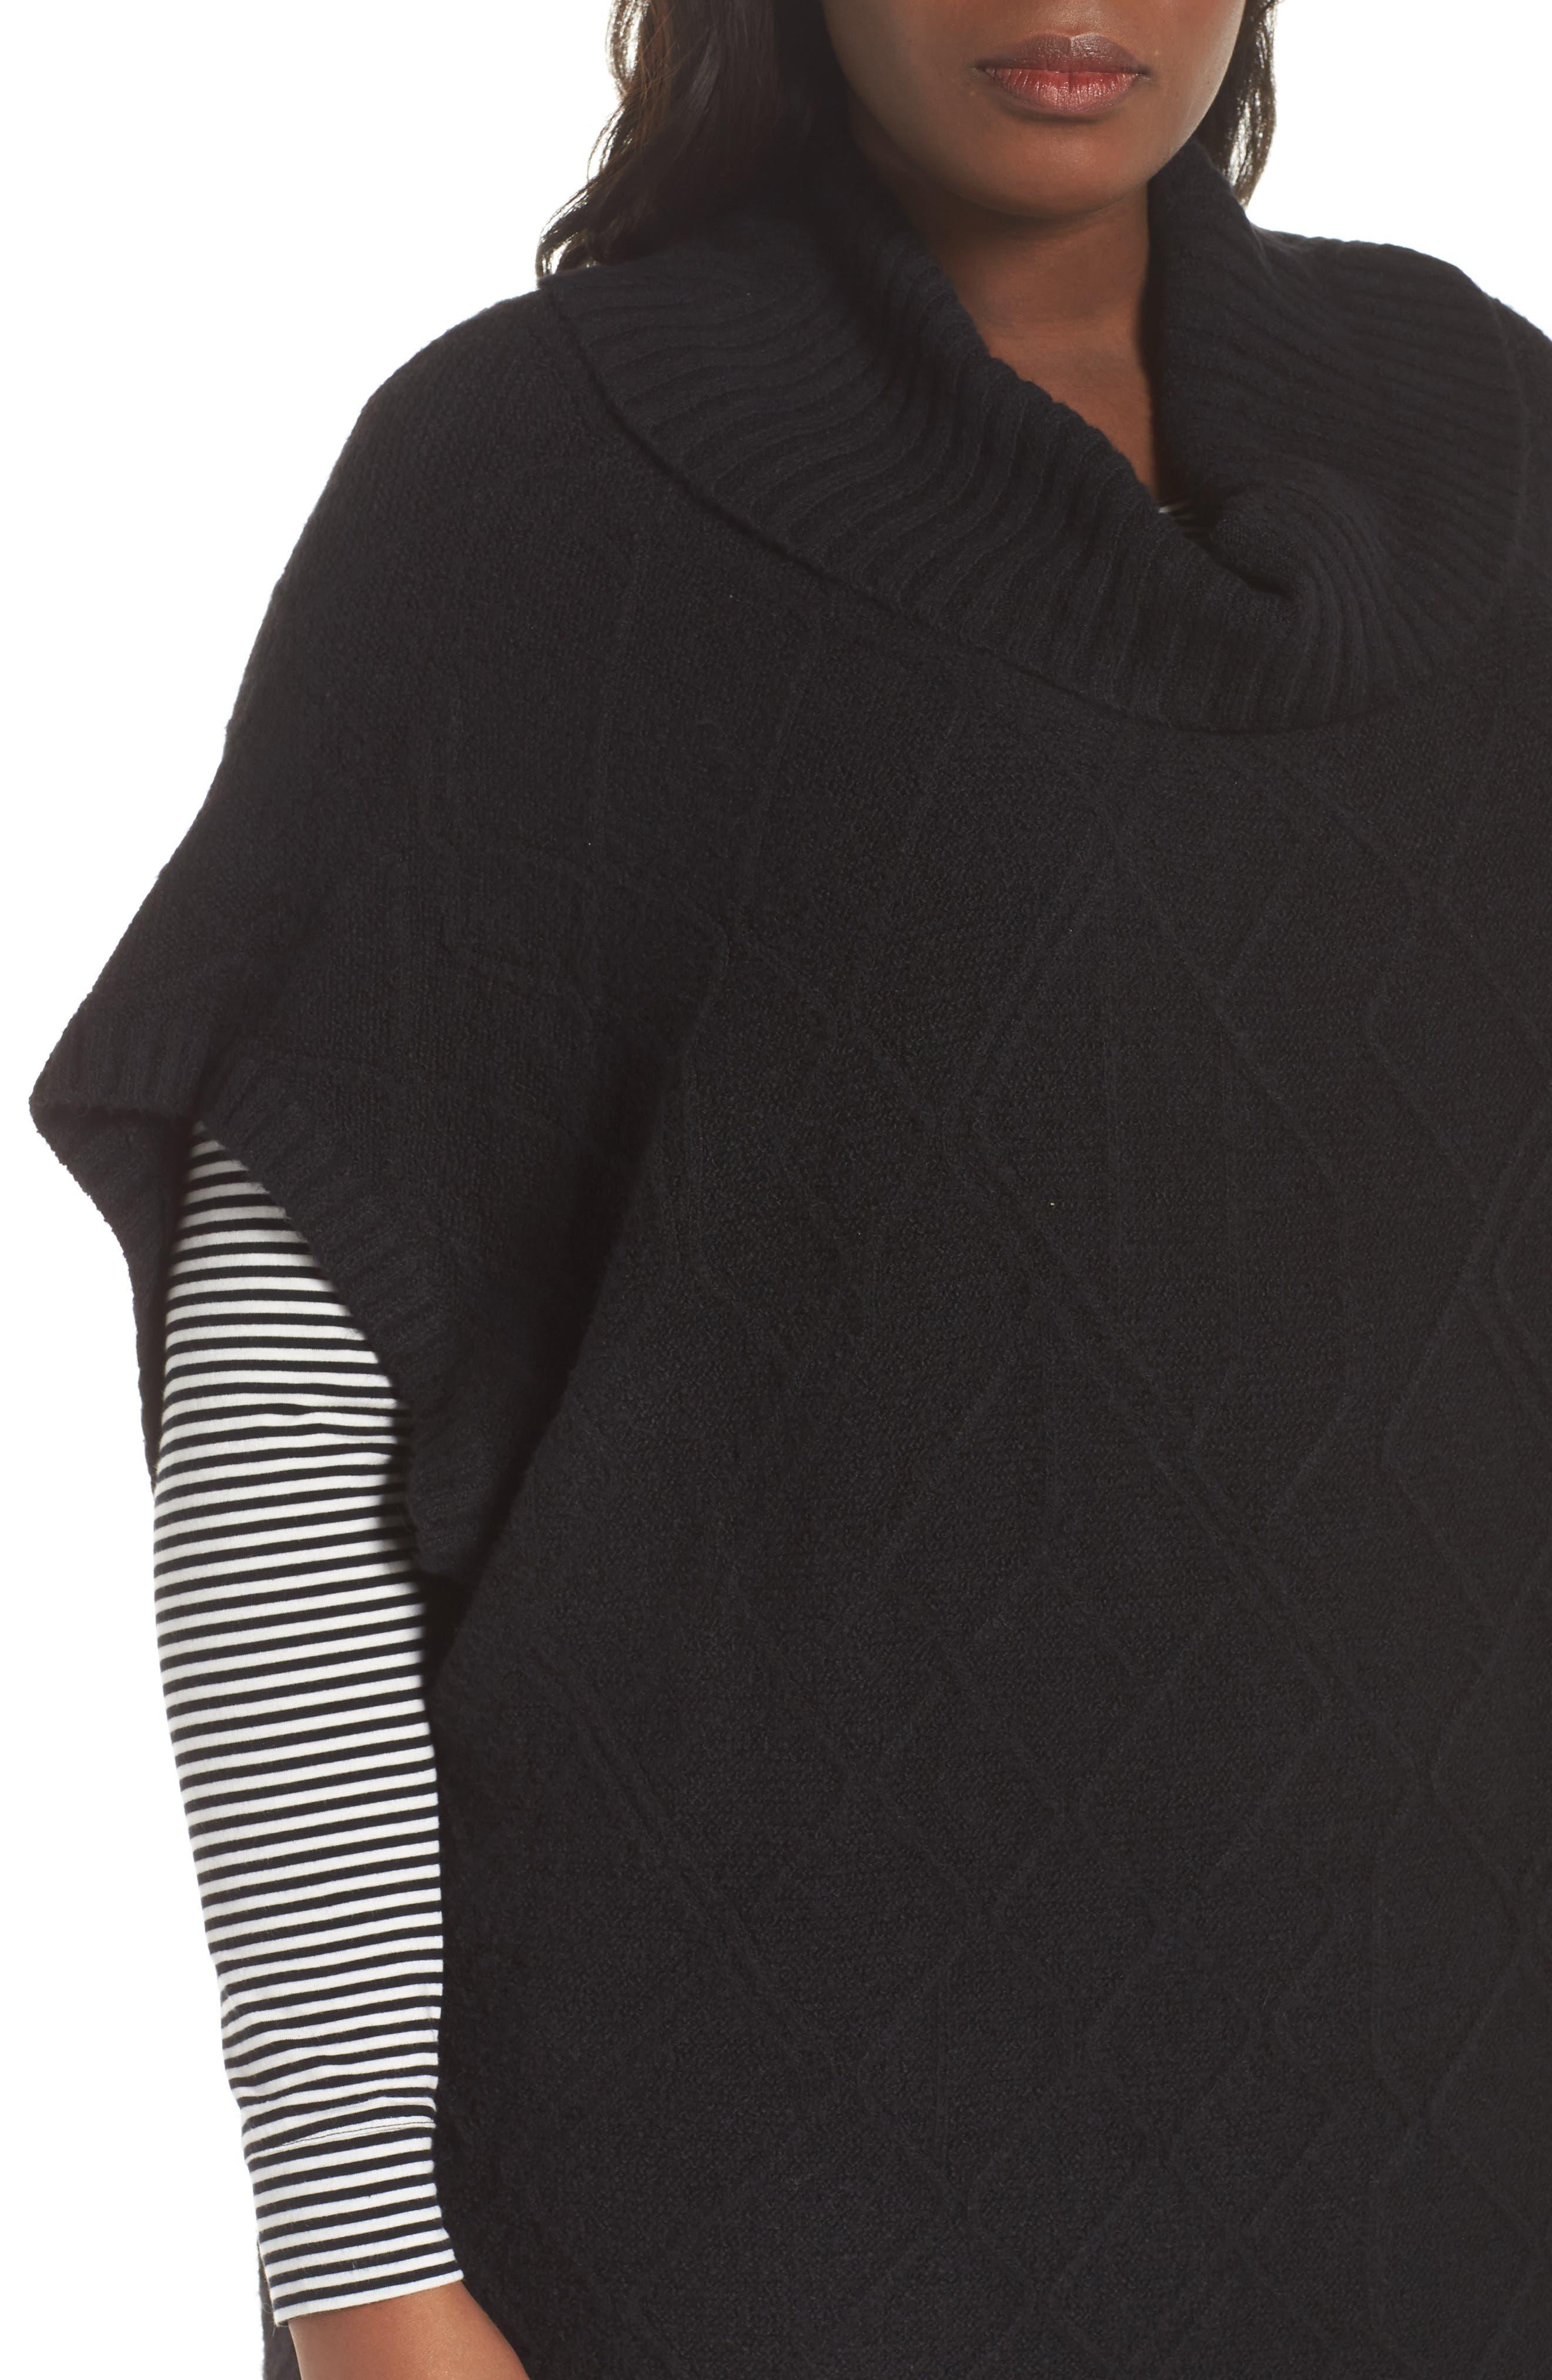 Poncho Sweater,                             Alternate thumbnail 4, color,                             BLACK